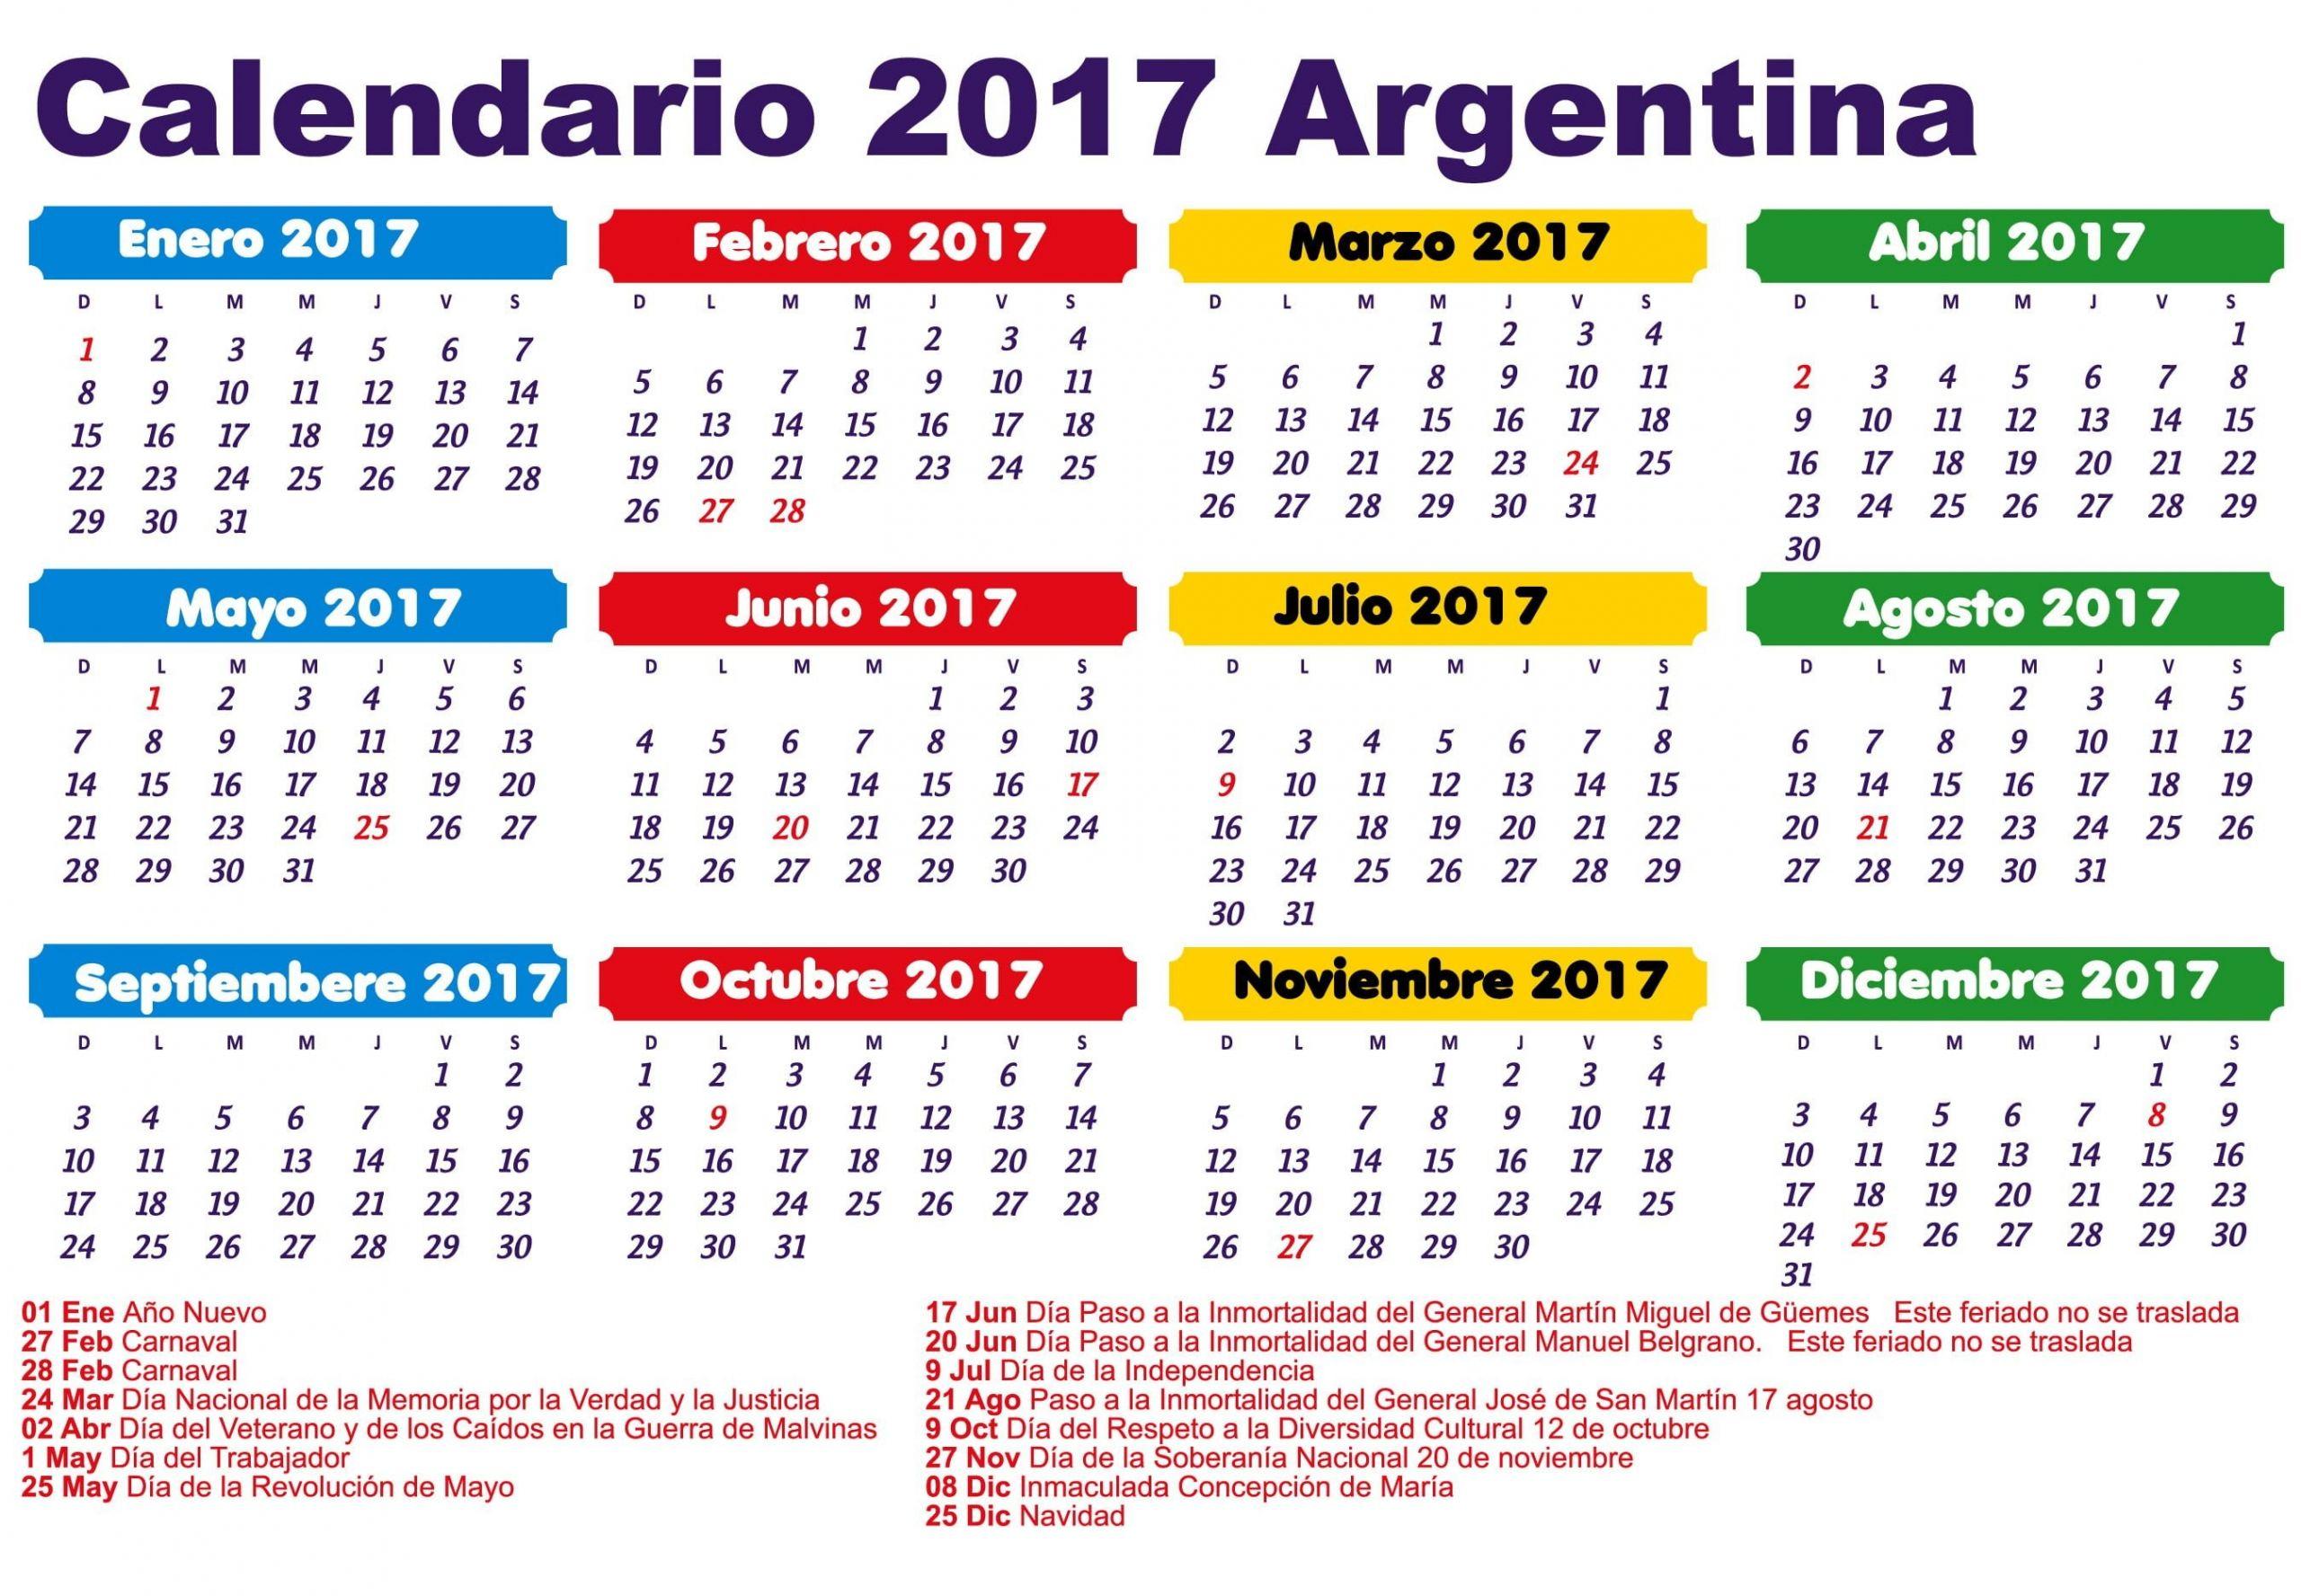 feriados 2017 argentina calendario 2017